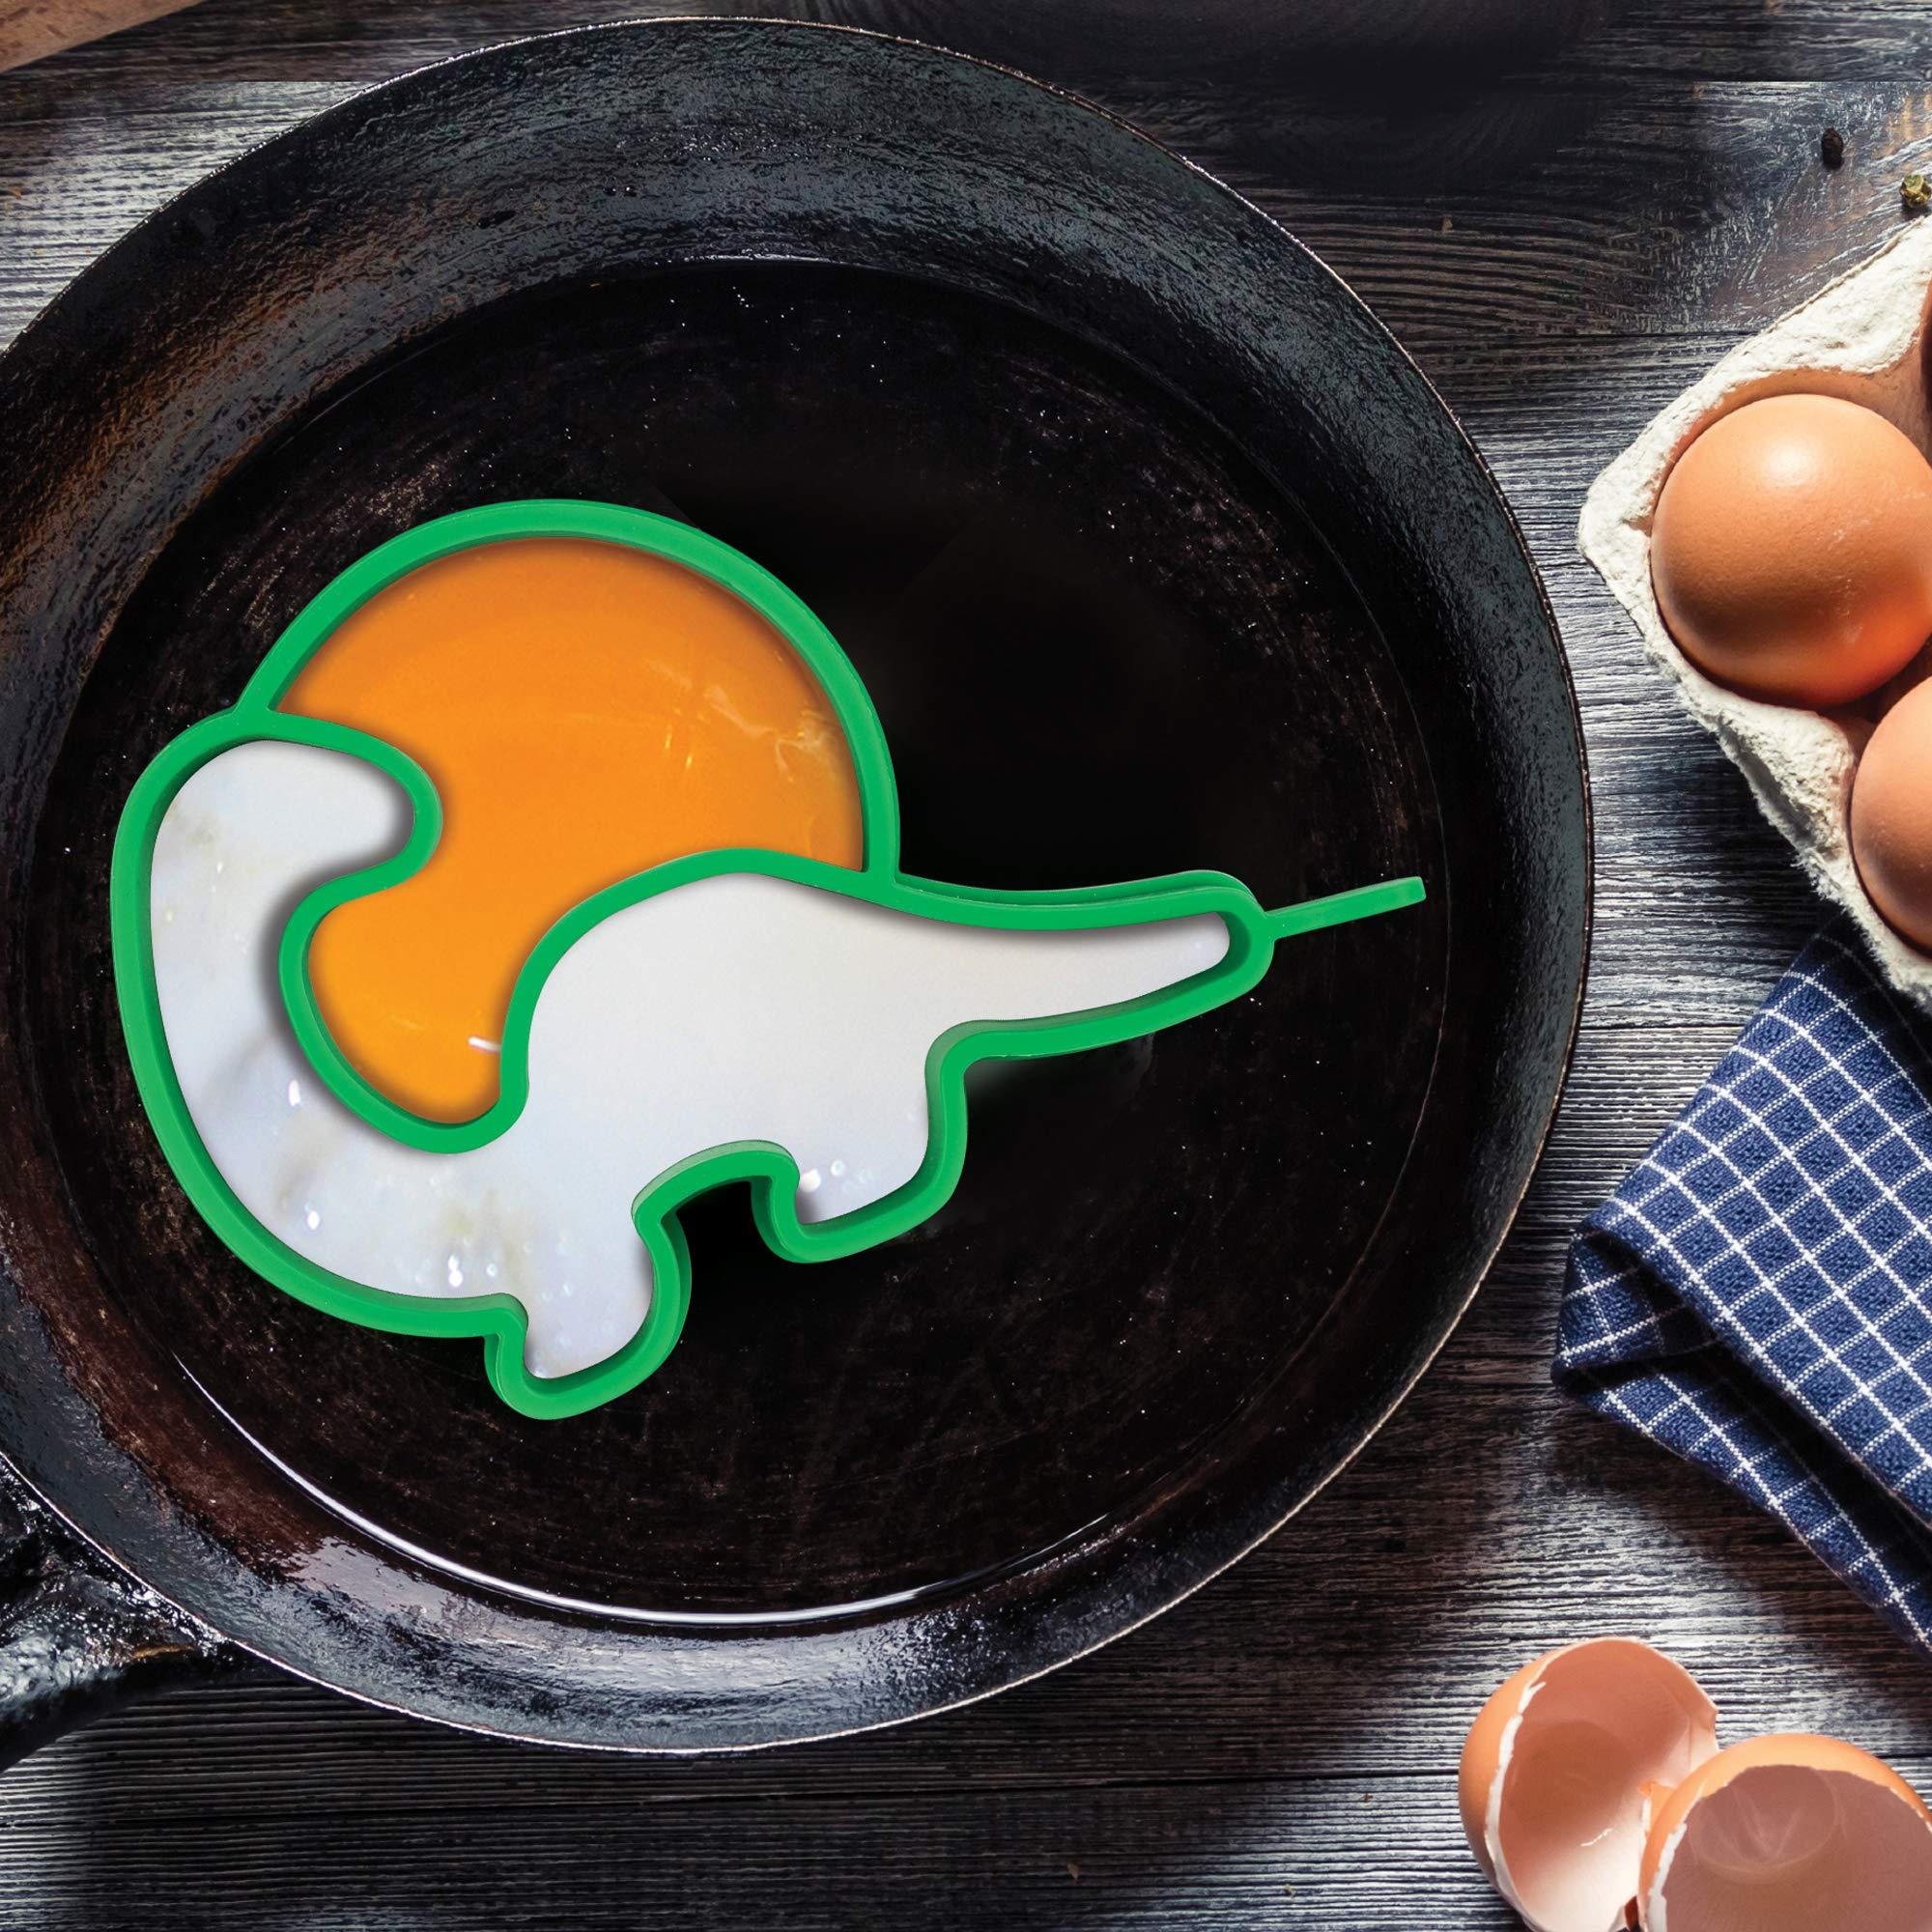 Funwares Eggosaurus Egg Shaper, Silicone, Dinosaur Egg & Pancake Mold